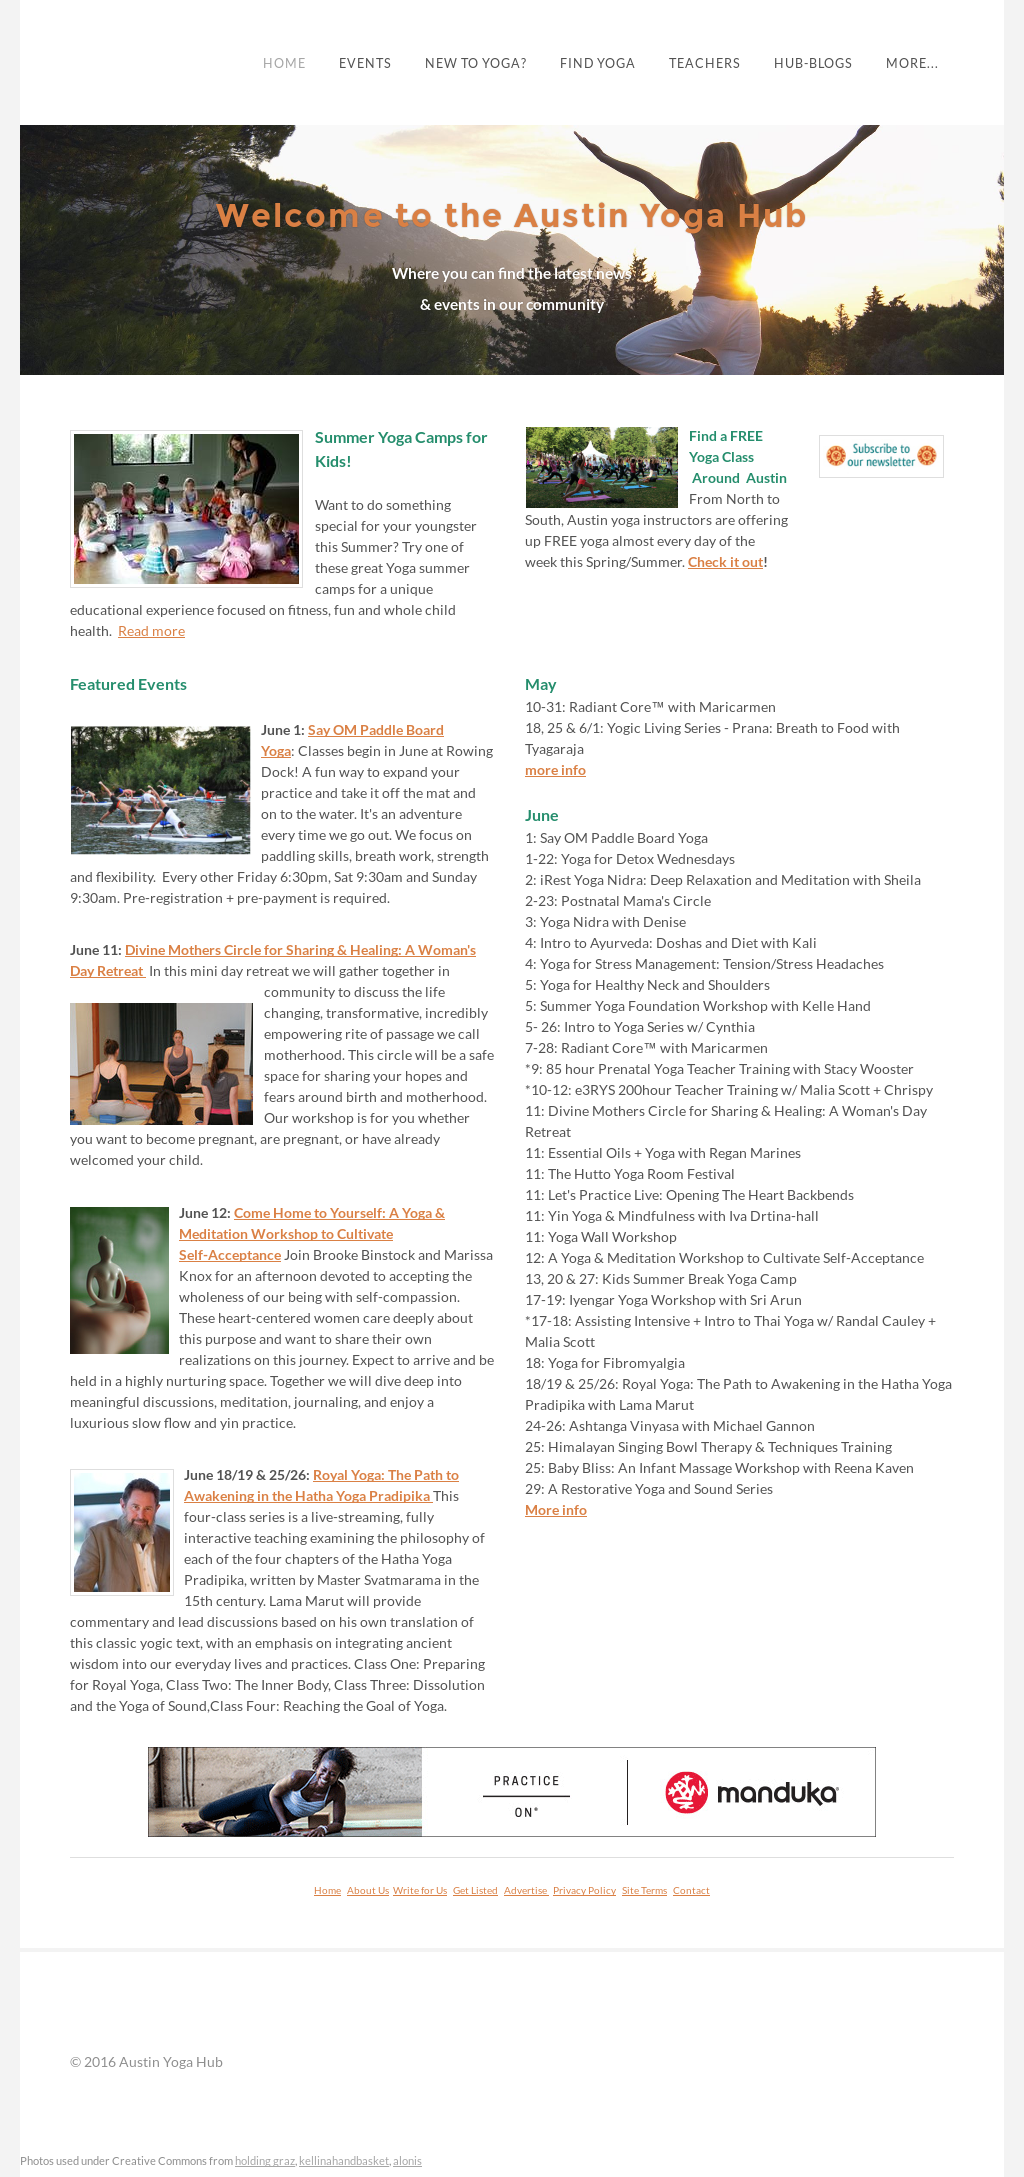 Austin Yoga Hub Competitors, Revenue and Employees - Owler